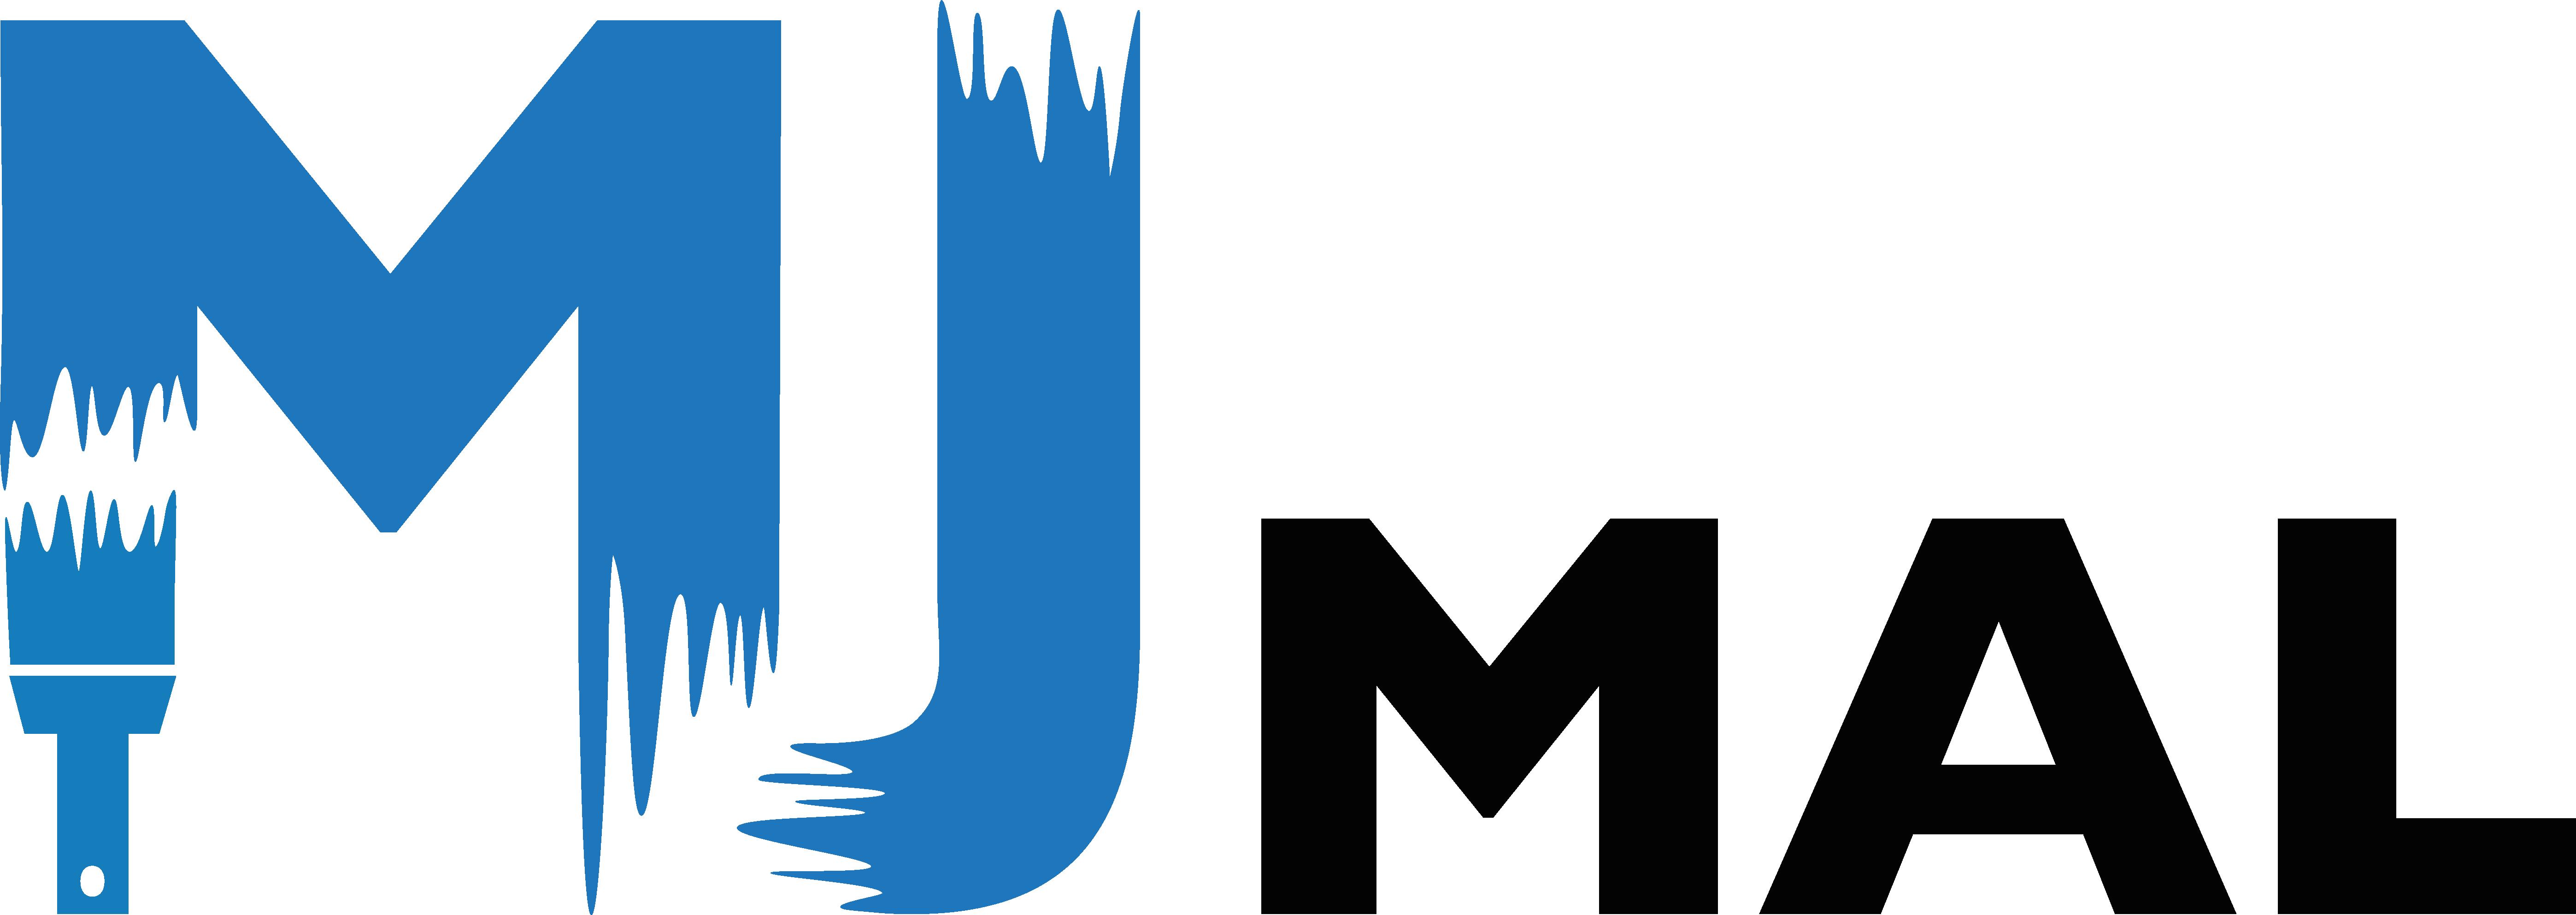 MJMAL